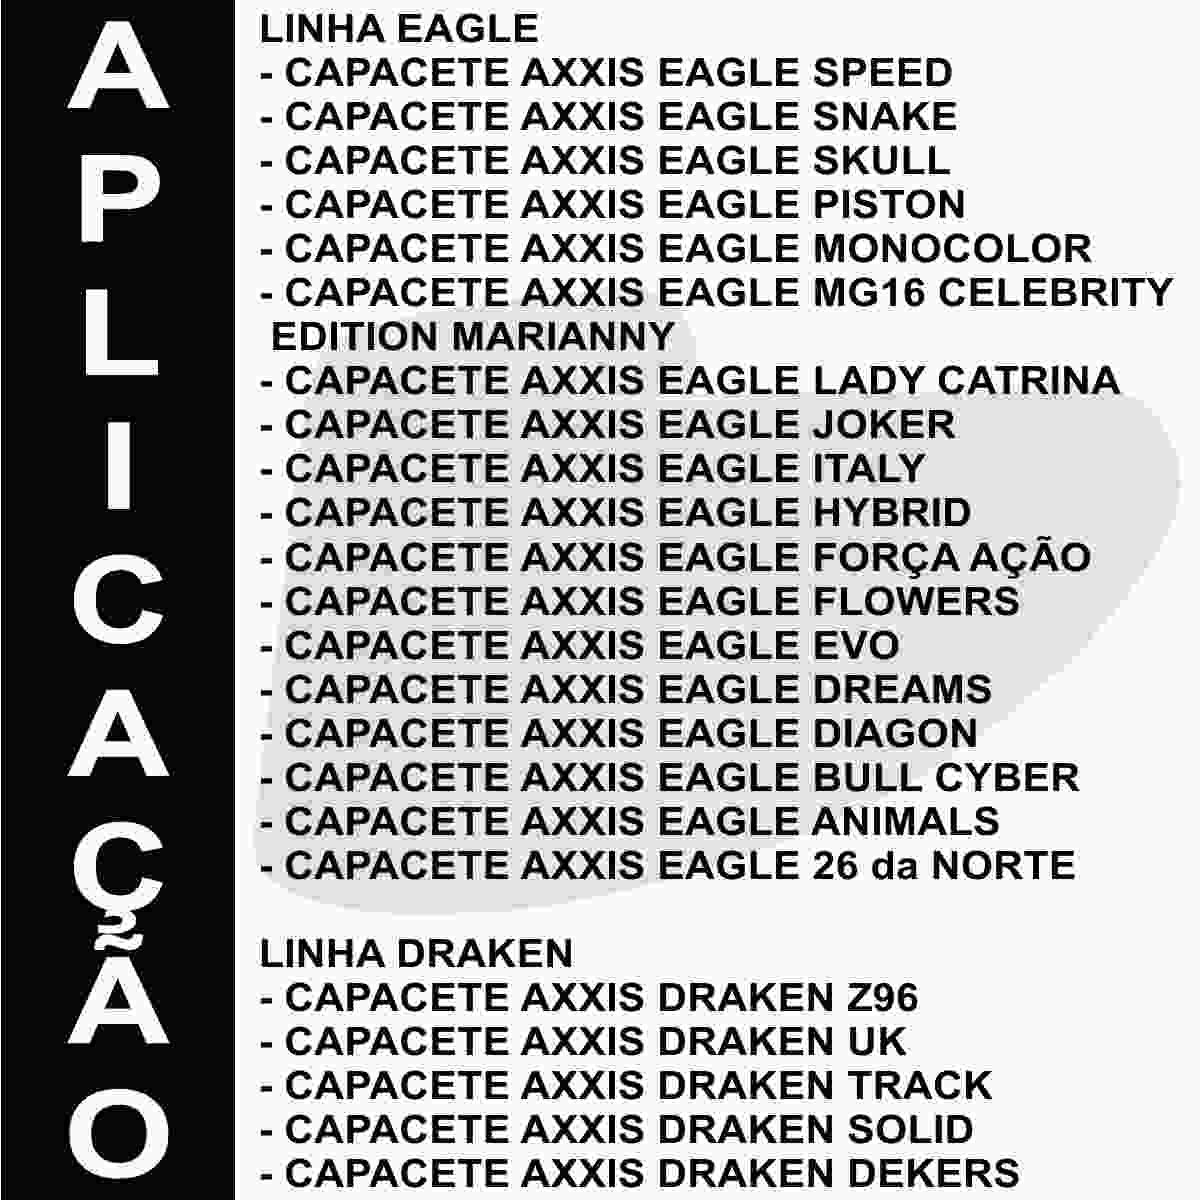 VISEIRA AXXIS EAGLE/DRAKEN IRIDIUM MULTICOR (CAMALEÃO) V18